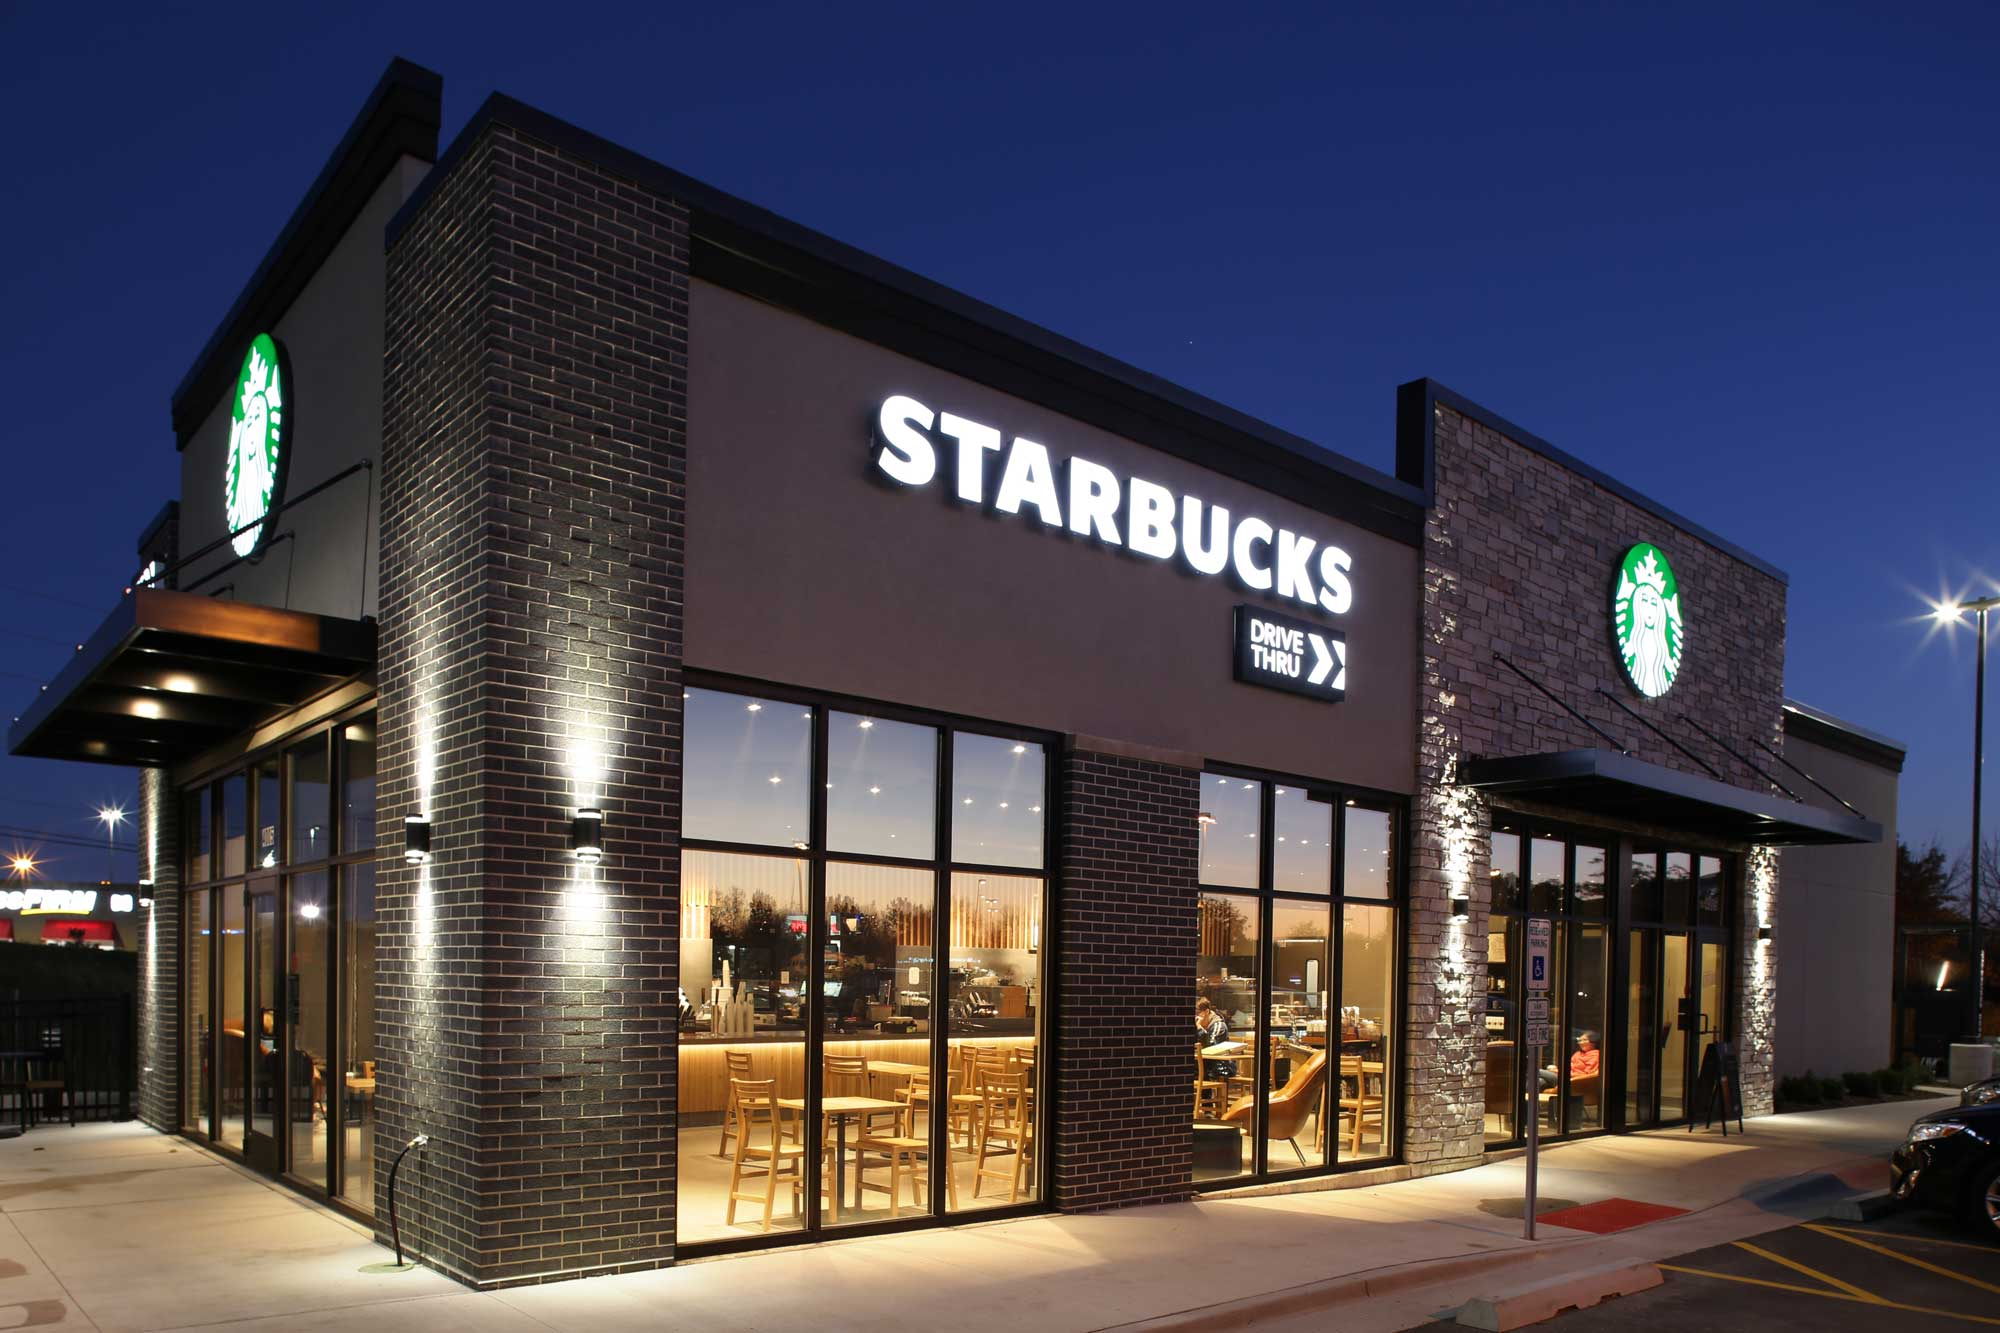 Feature of Starbucks Coffee built on John Deere Road